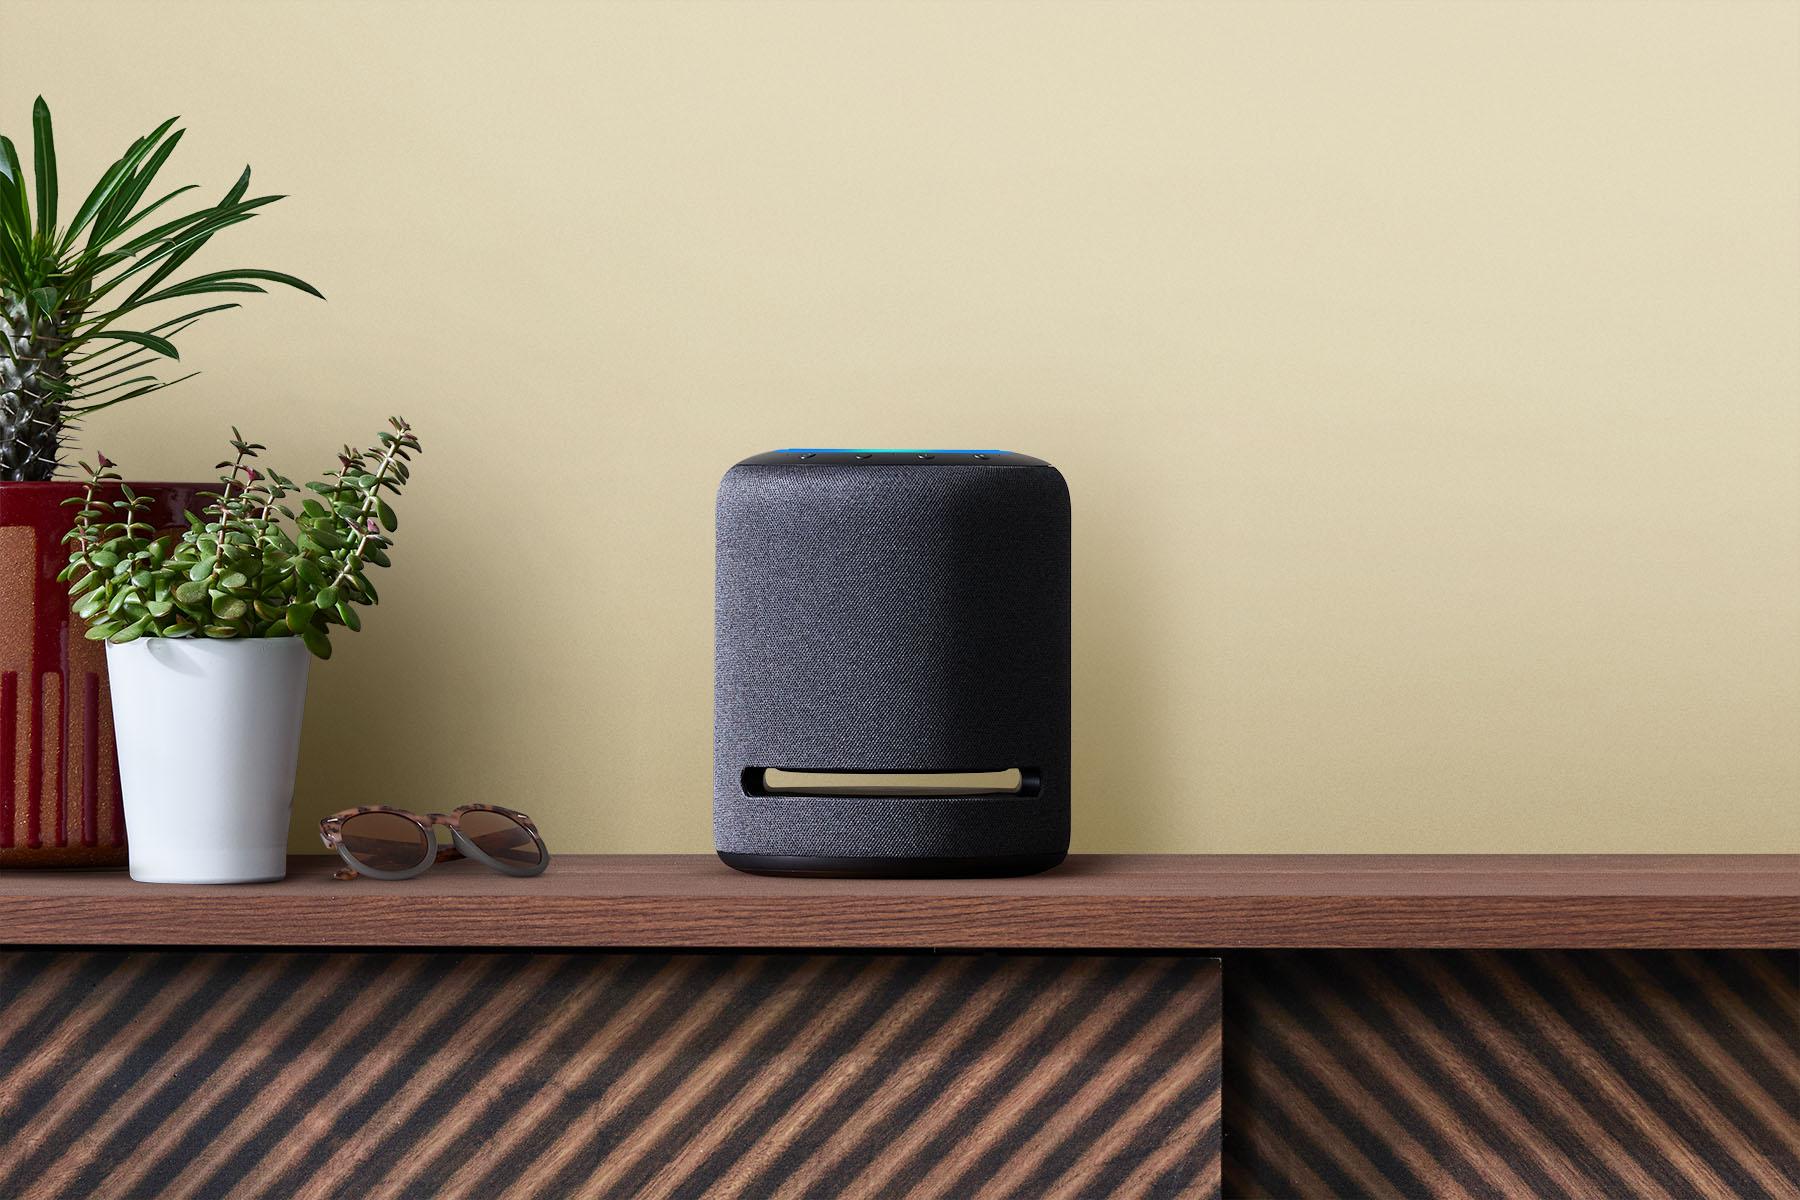 Amazon Eco Studio